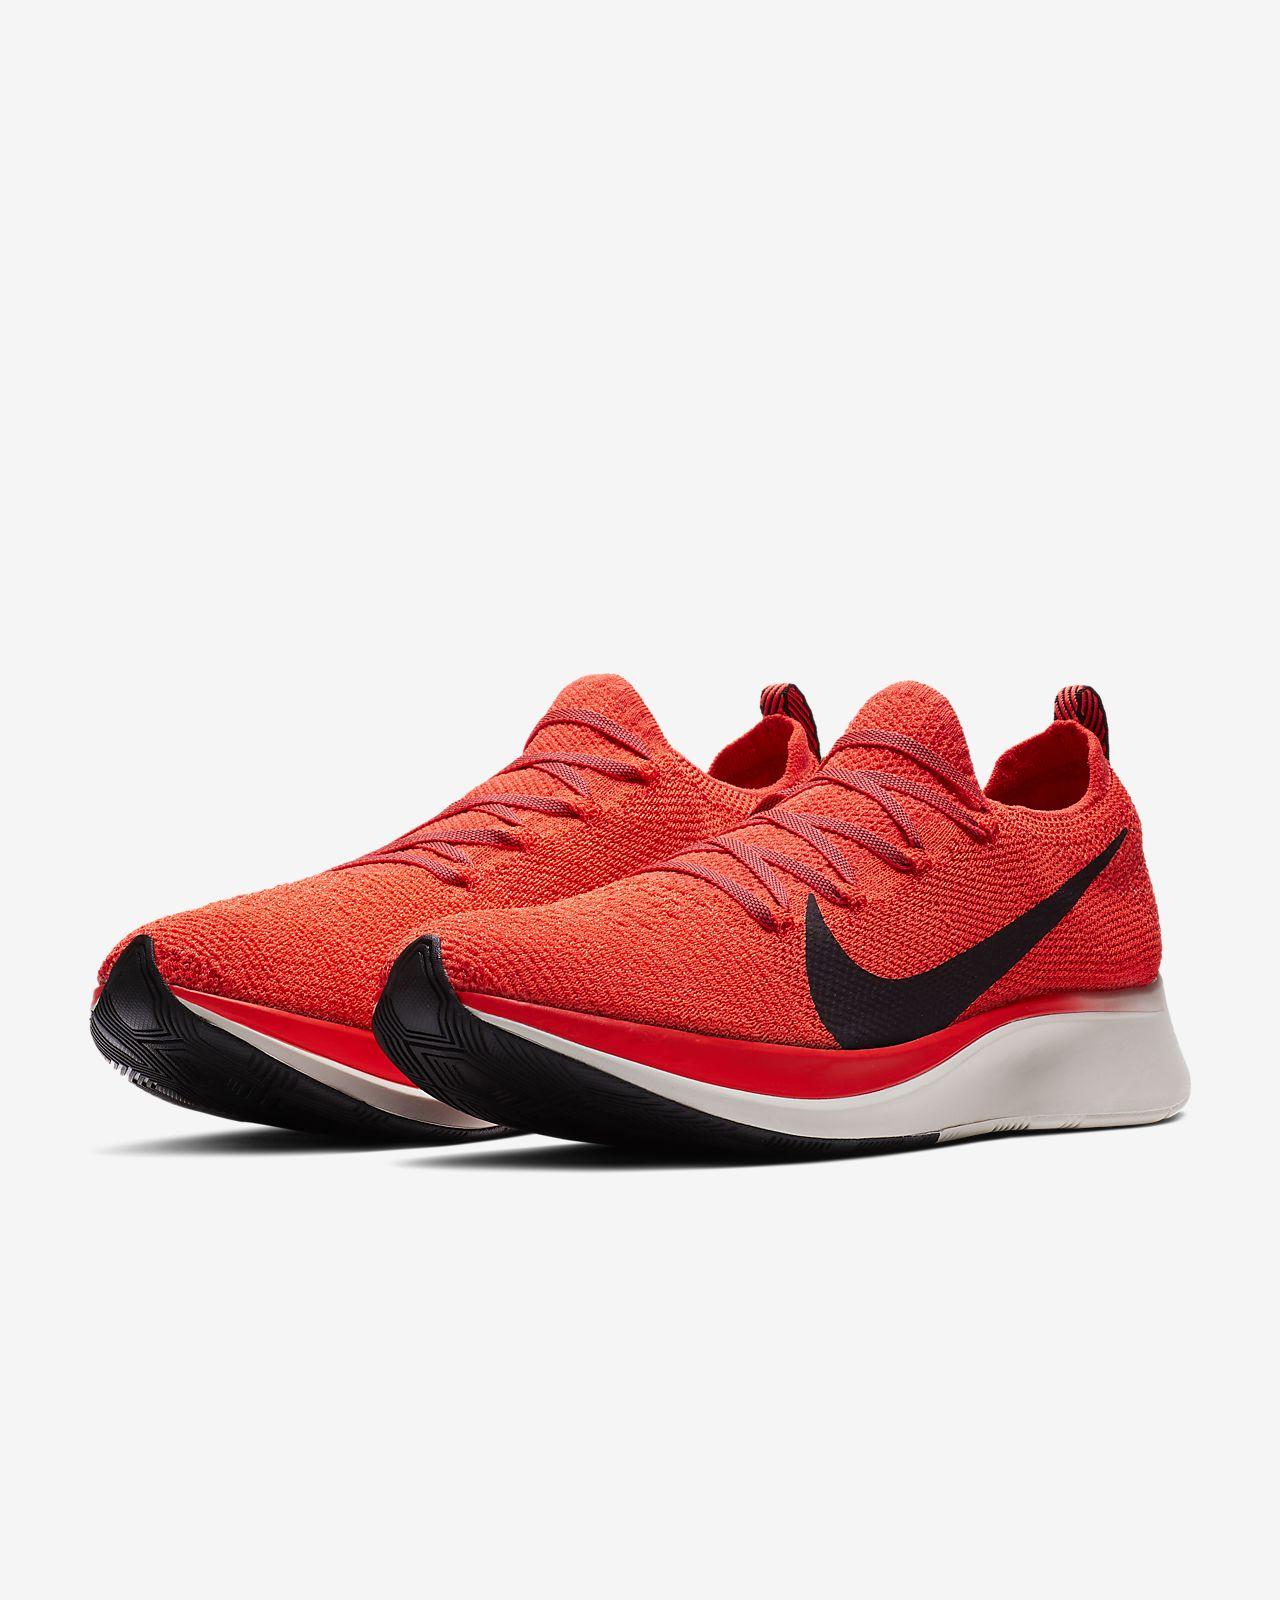 02b19ba57a5f Nike Zoom Fly Flyknit Men s Running Shoe. Nike.com